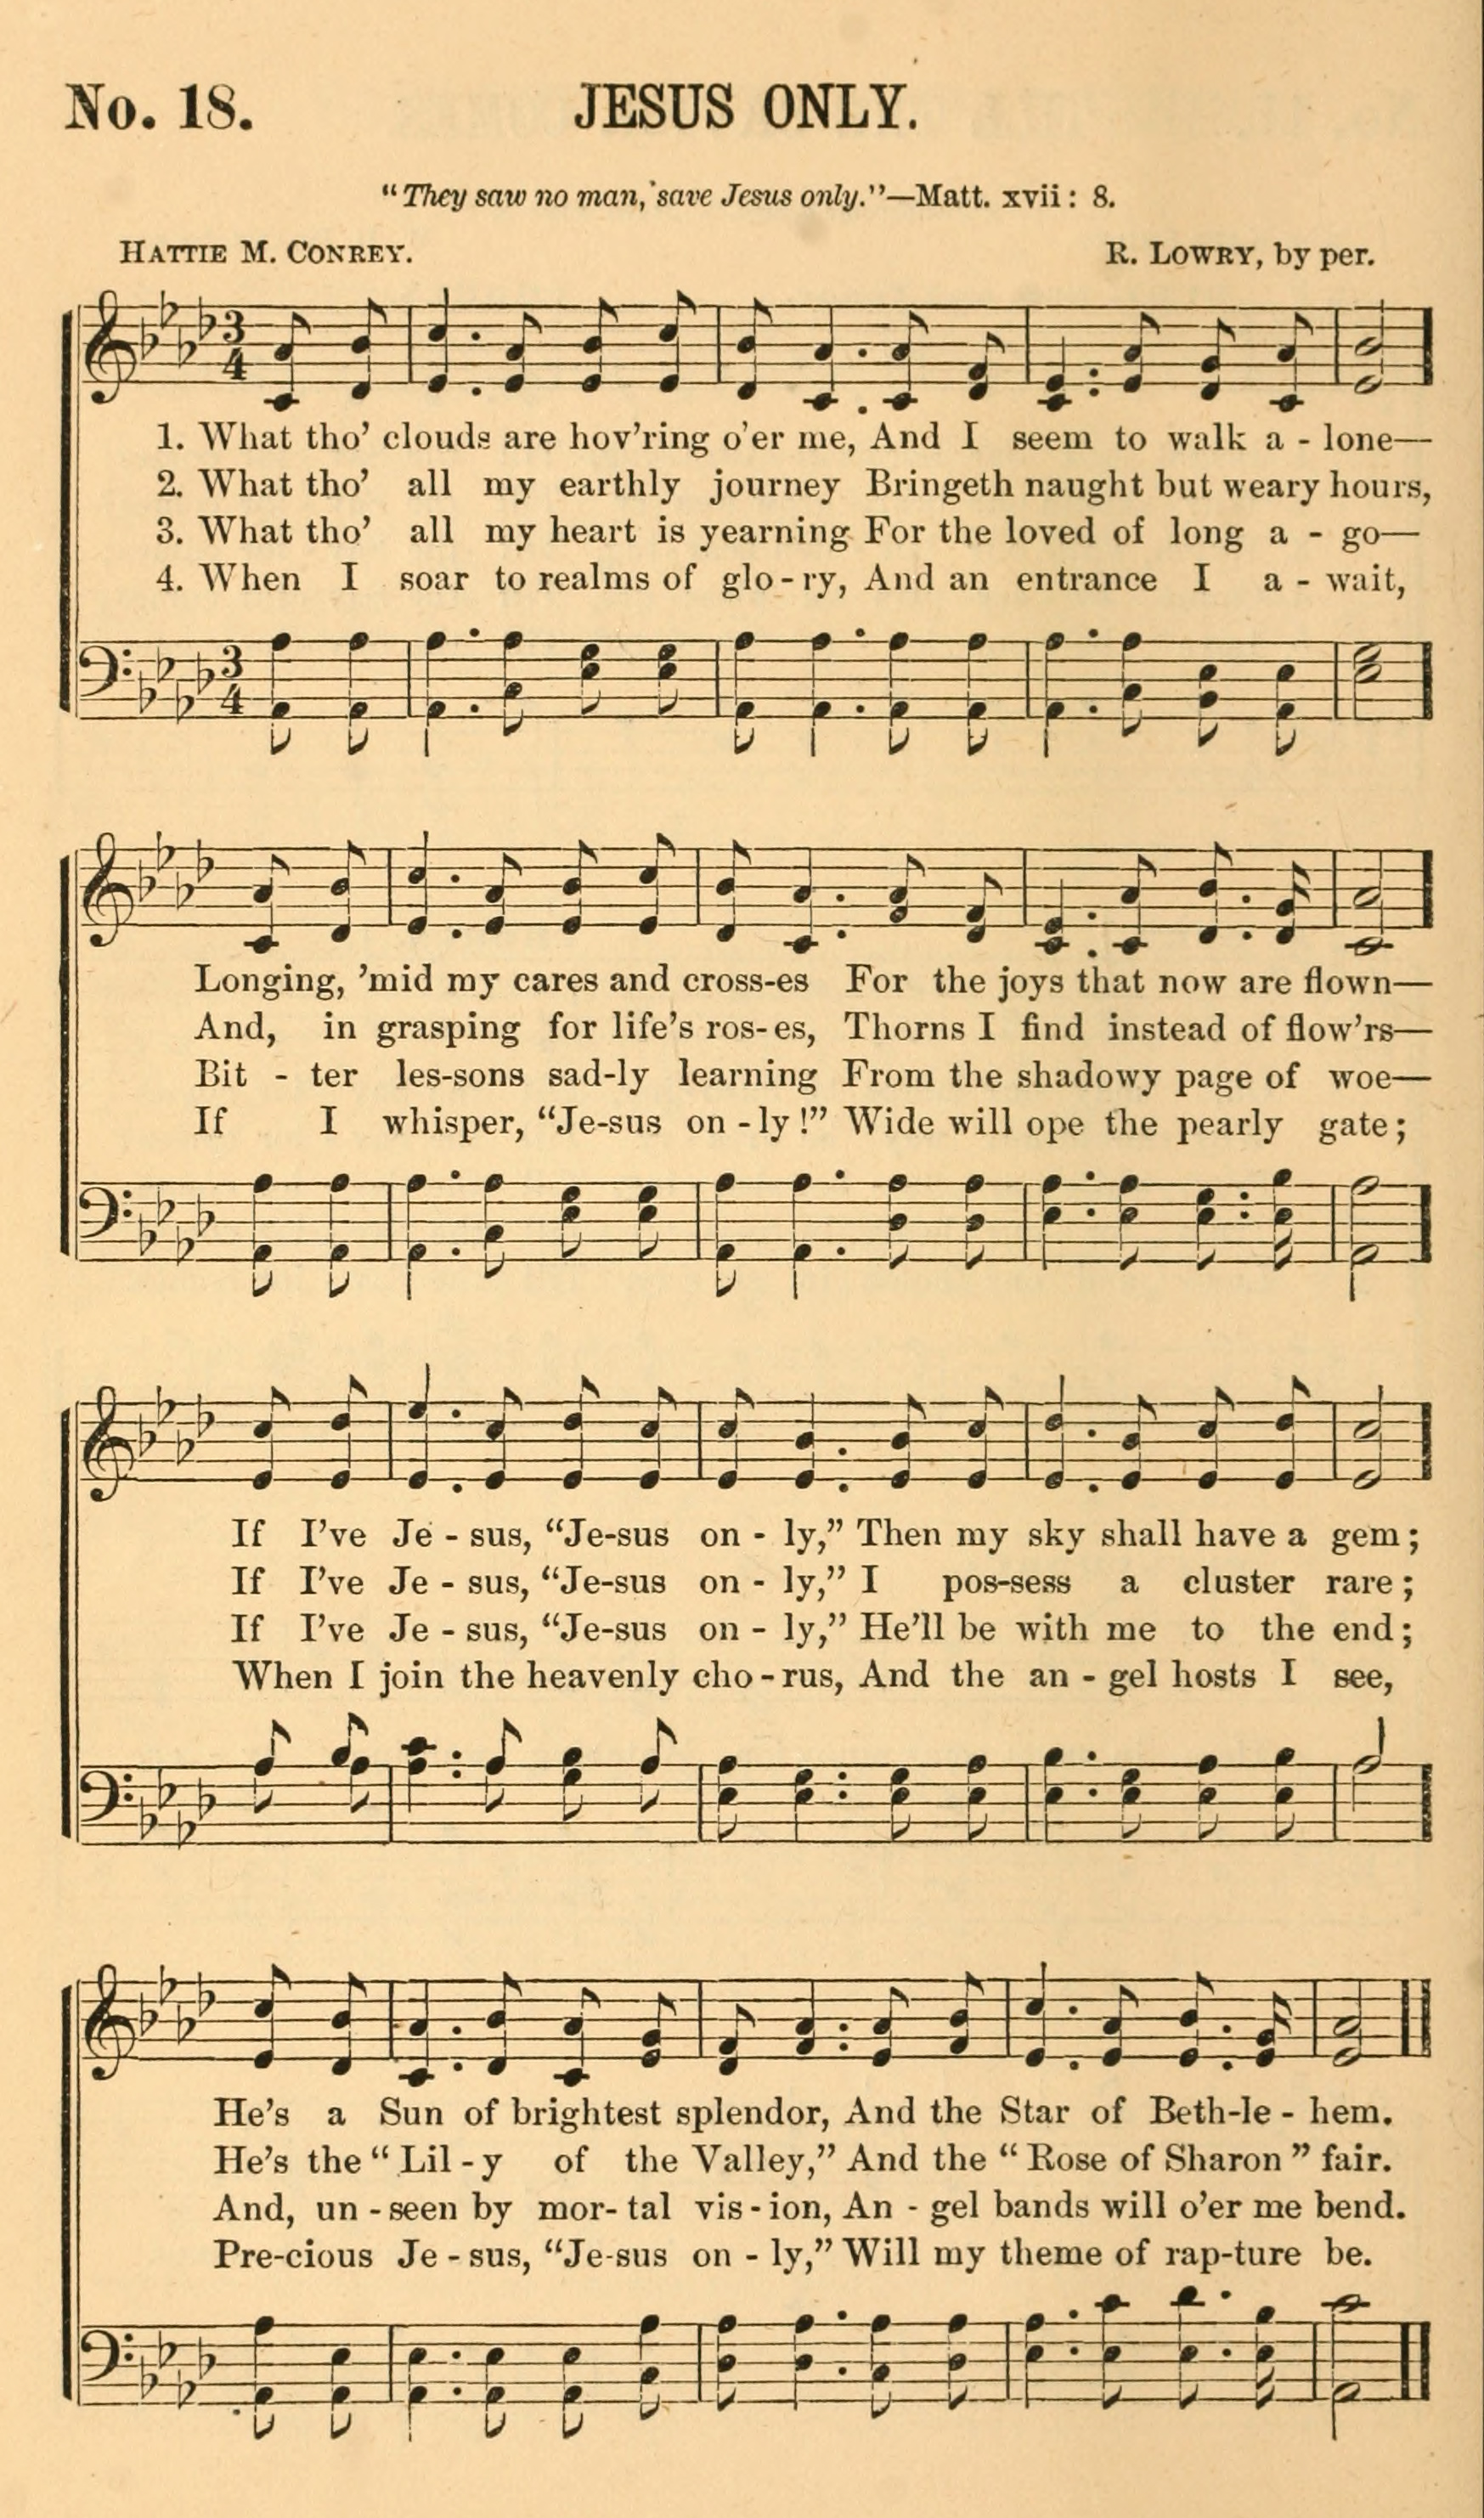 Fig. 5.  Robert Lowry & Wm. H. Doane,  Gospel Music  (NY: Biglow & Main, 1877).